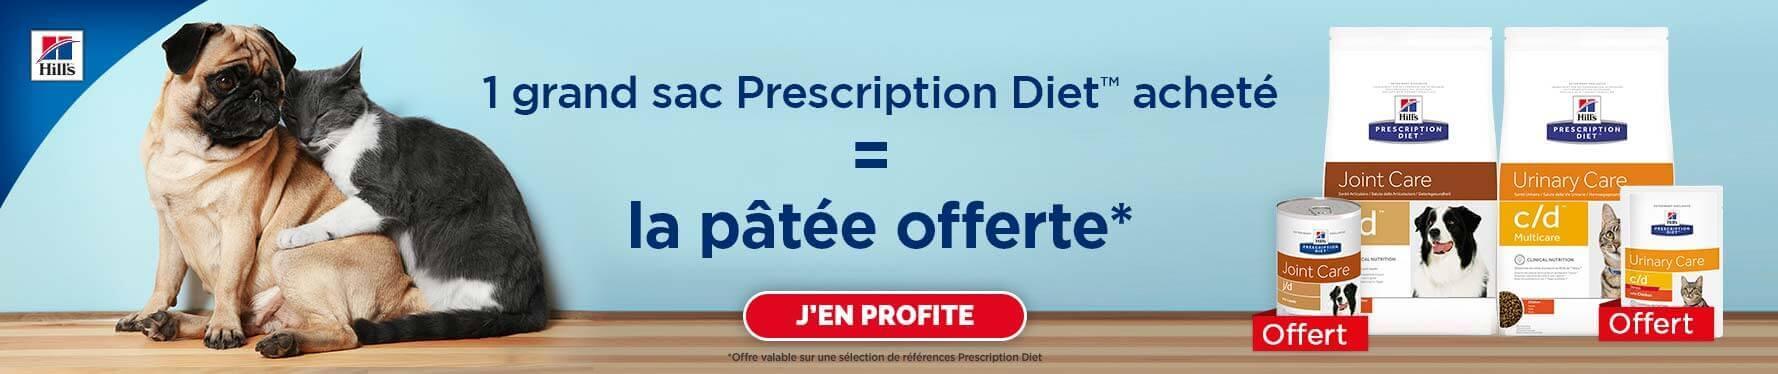 Offre Hill's Prescription Diet Mars